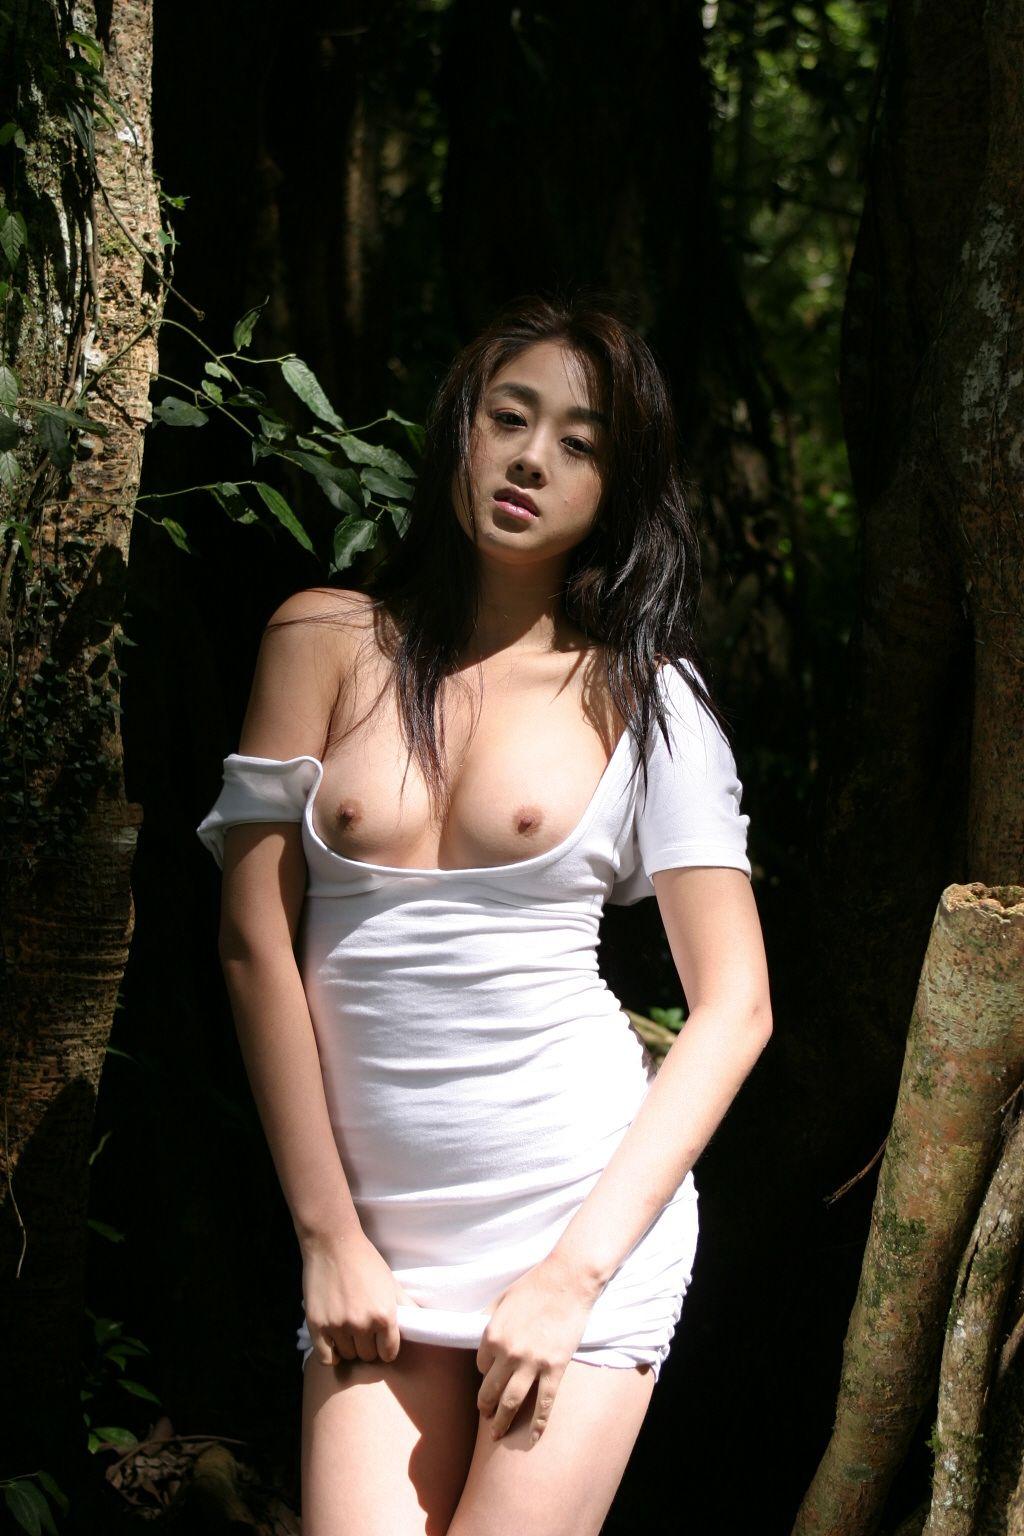 ham-so-won-nude